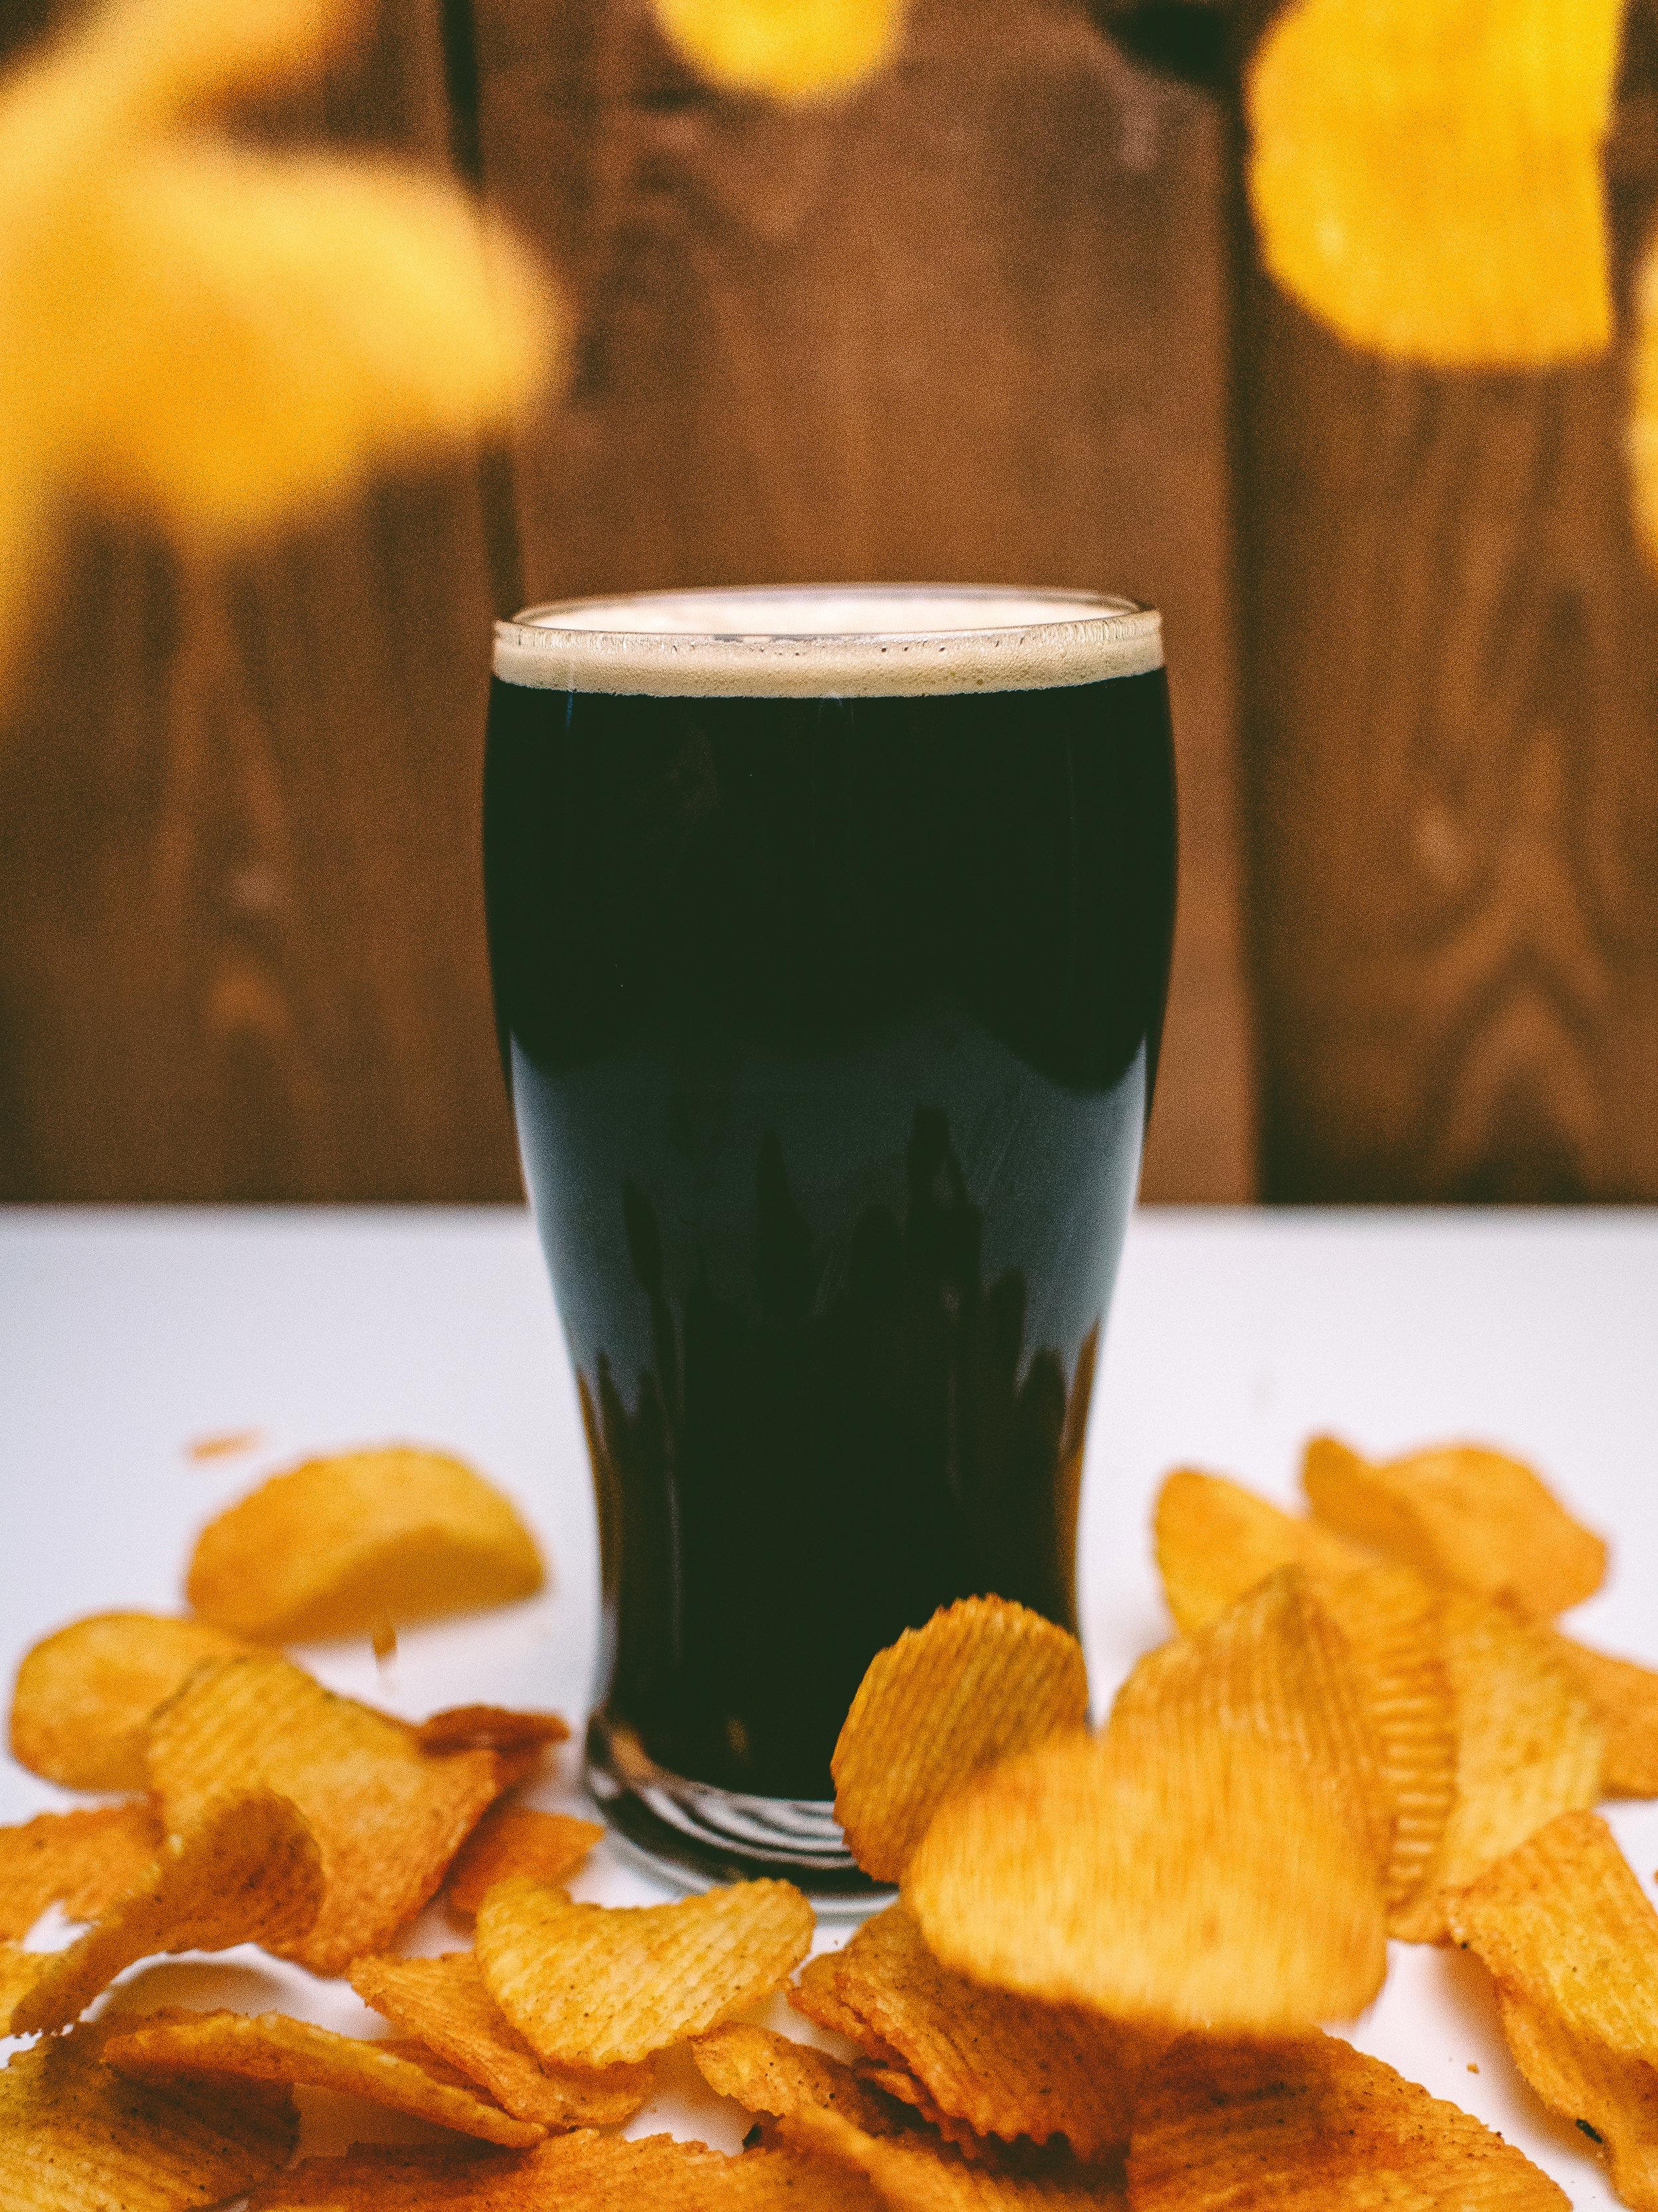 food-wood-night-alcohol.jpg